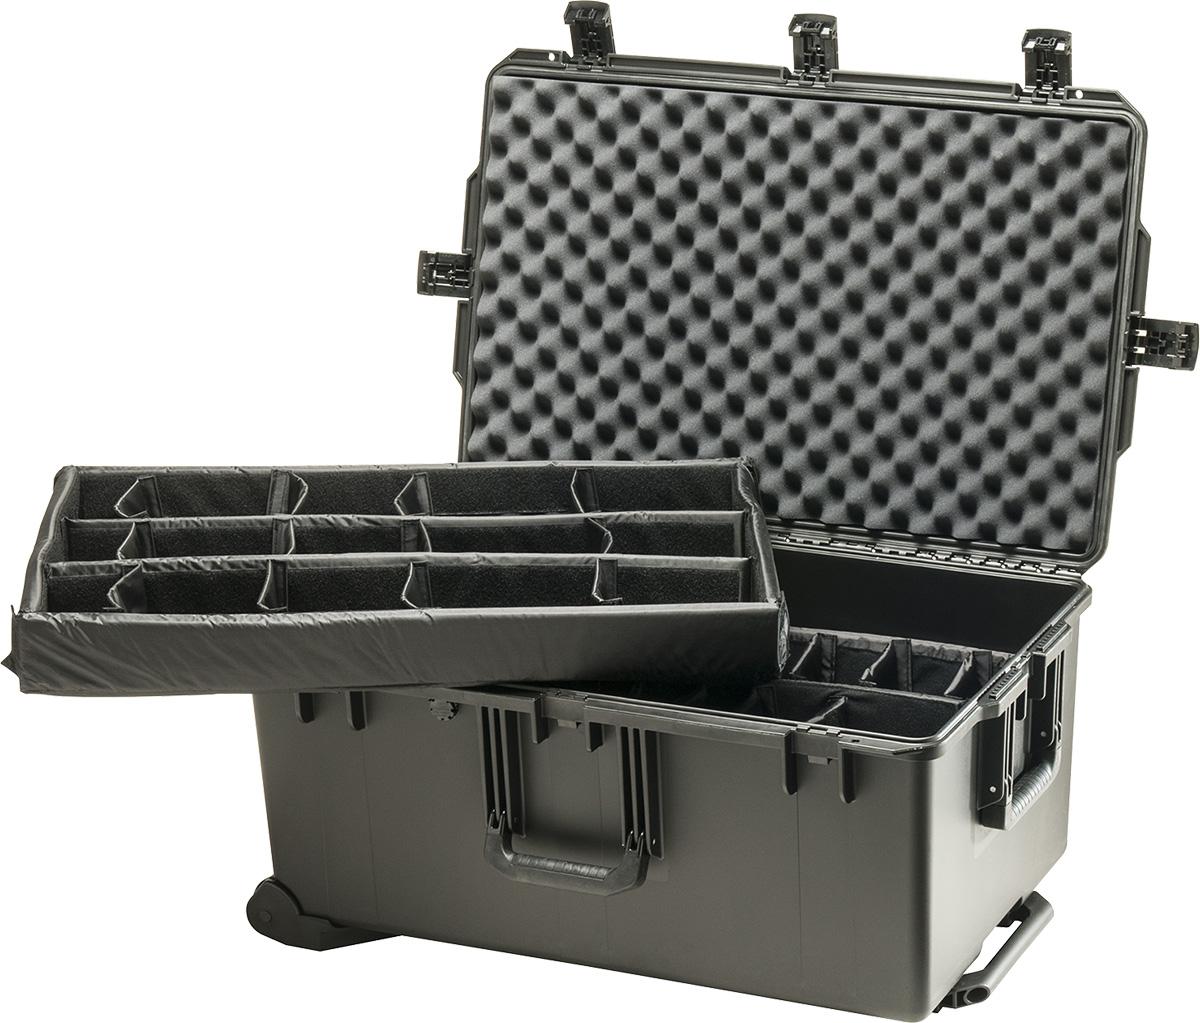 pelican im2975 padded camera case